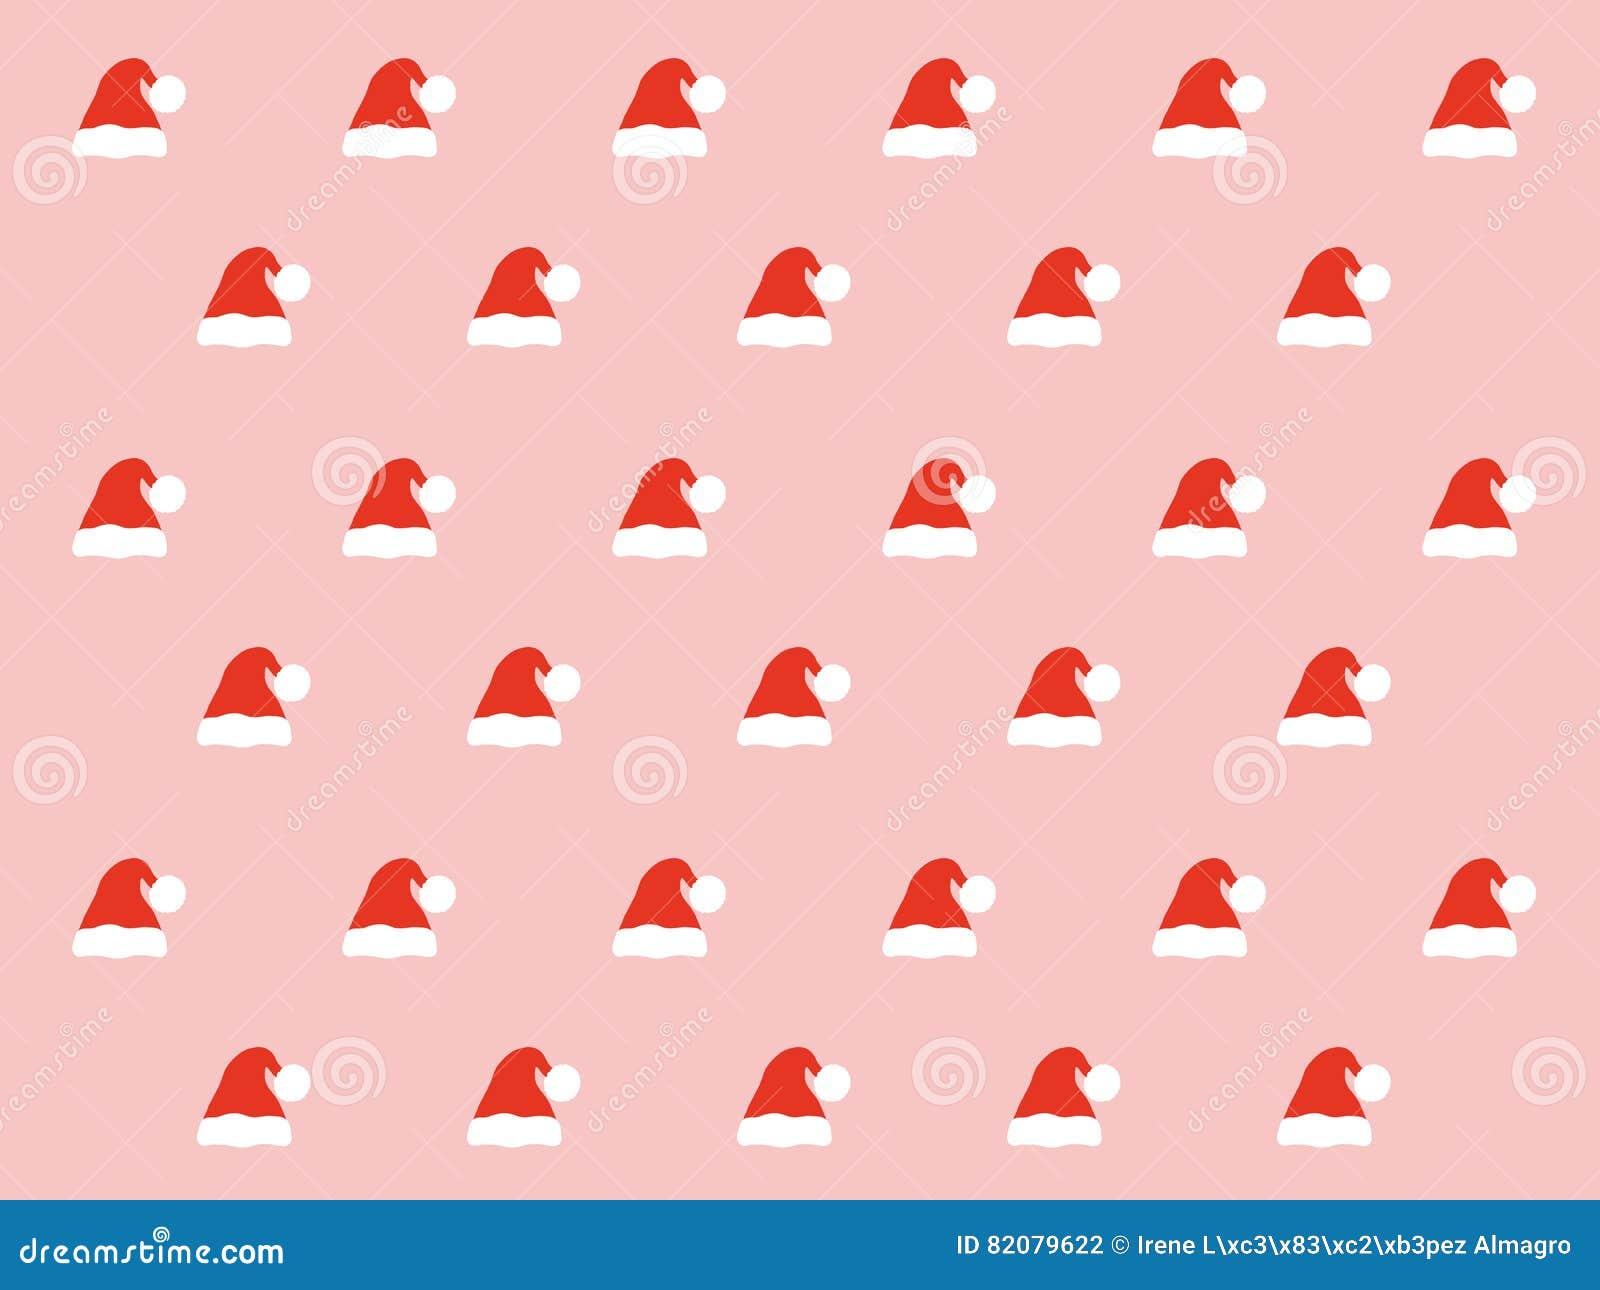 Santa hat pattern stock vector. Illustration of decoration - 82079622 3b90d0dc09d